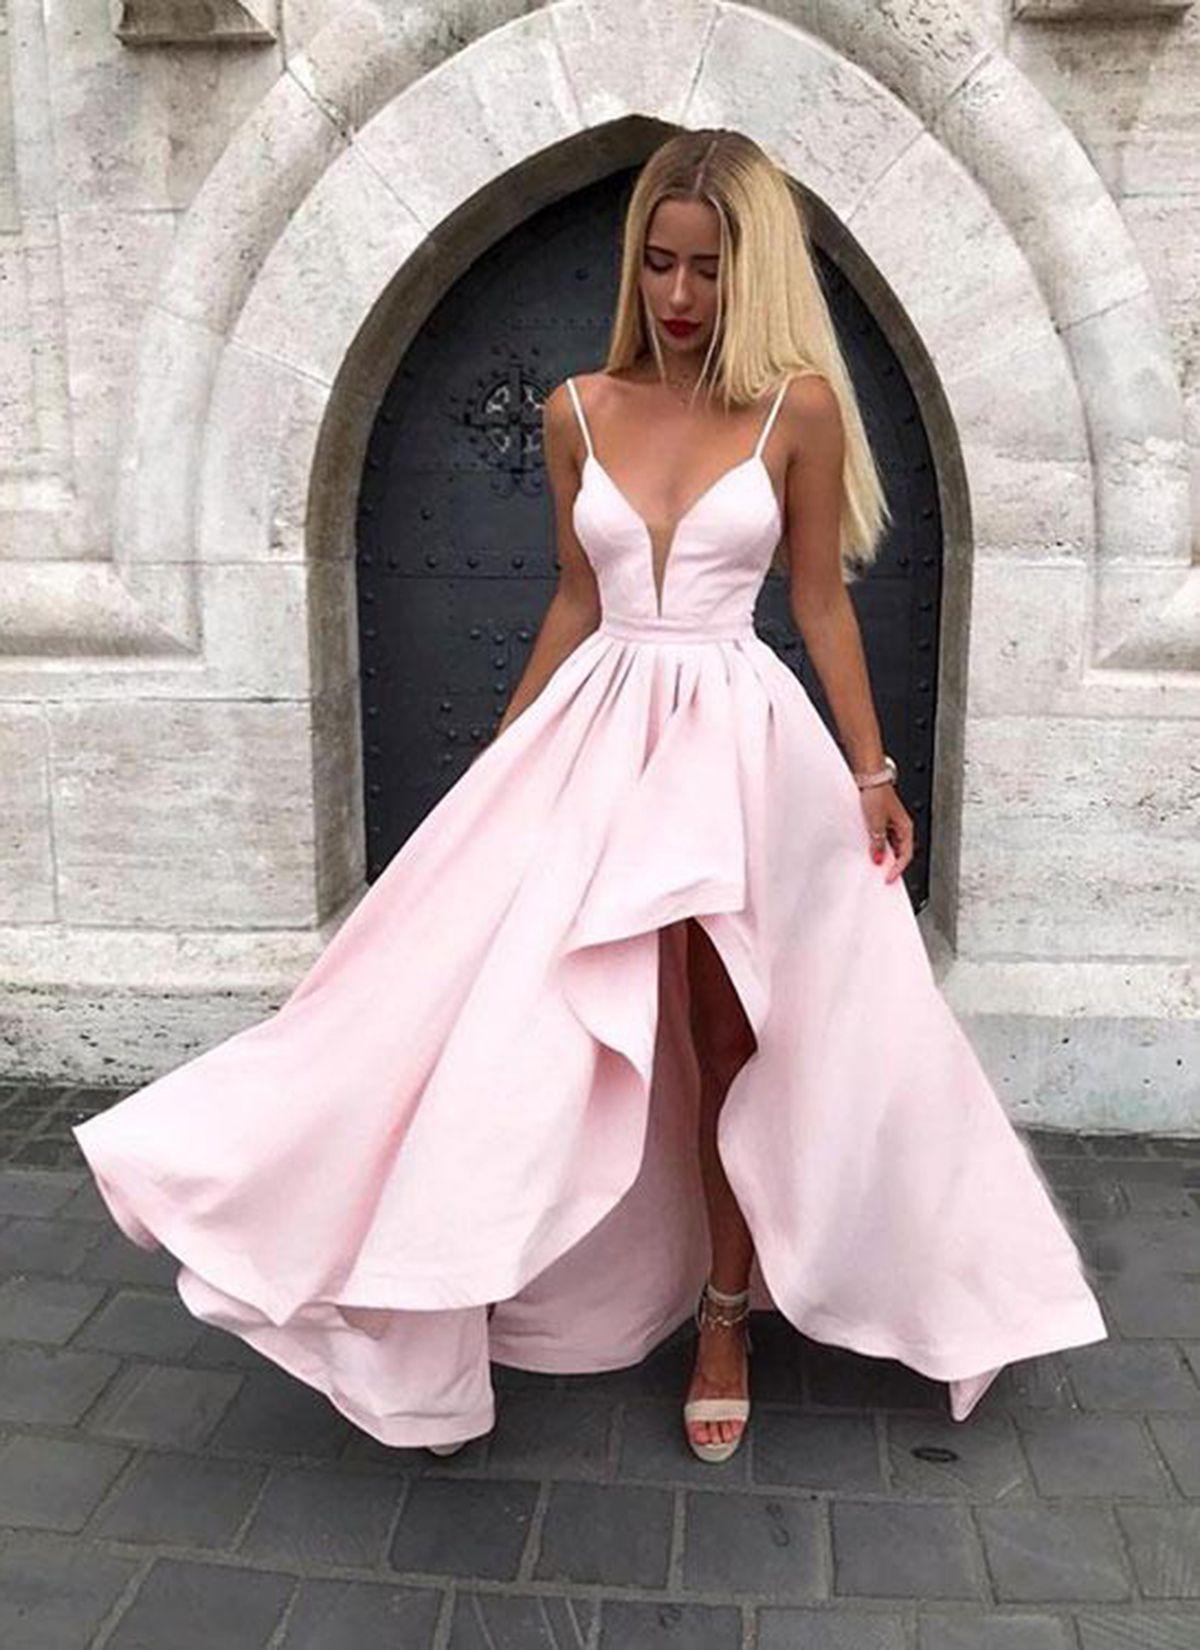 d7760a4f1d0 Light Pink Prom Dresses High Low